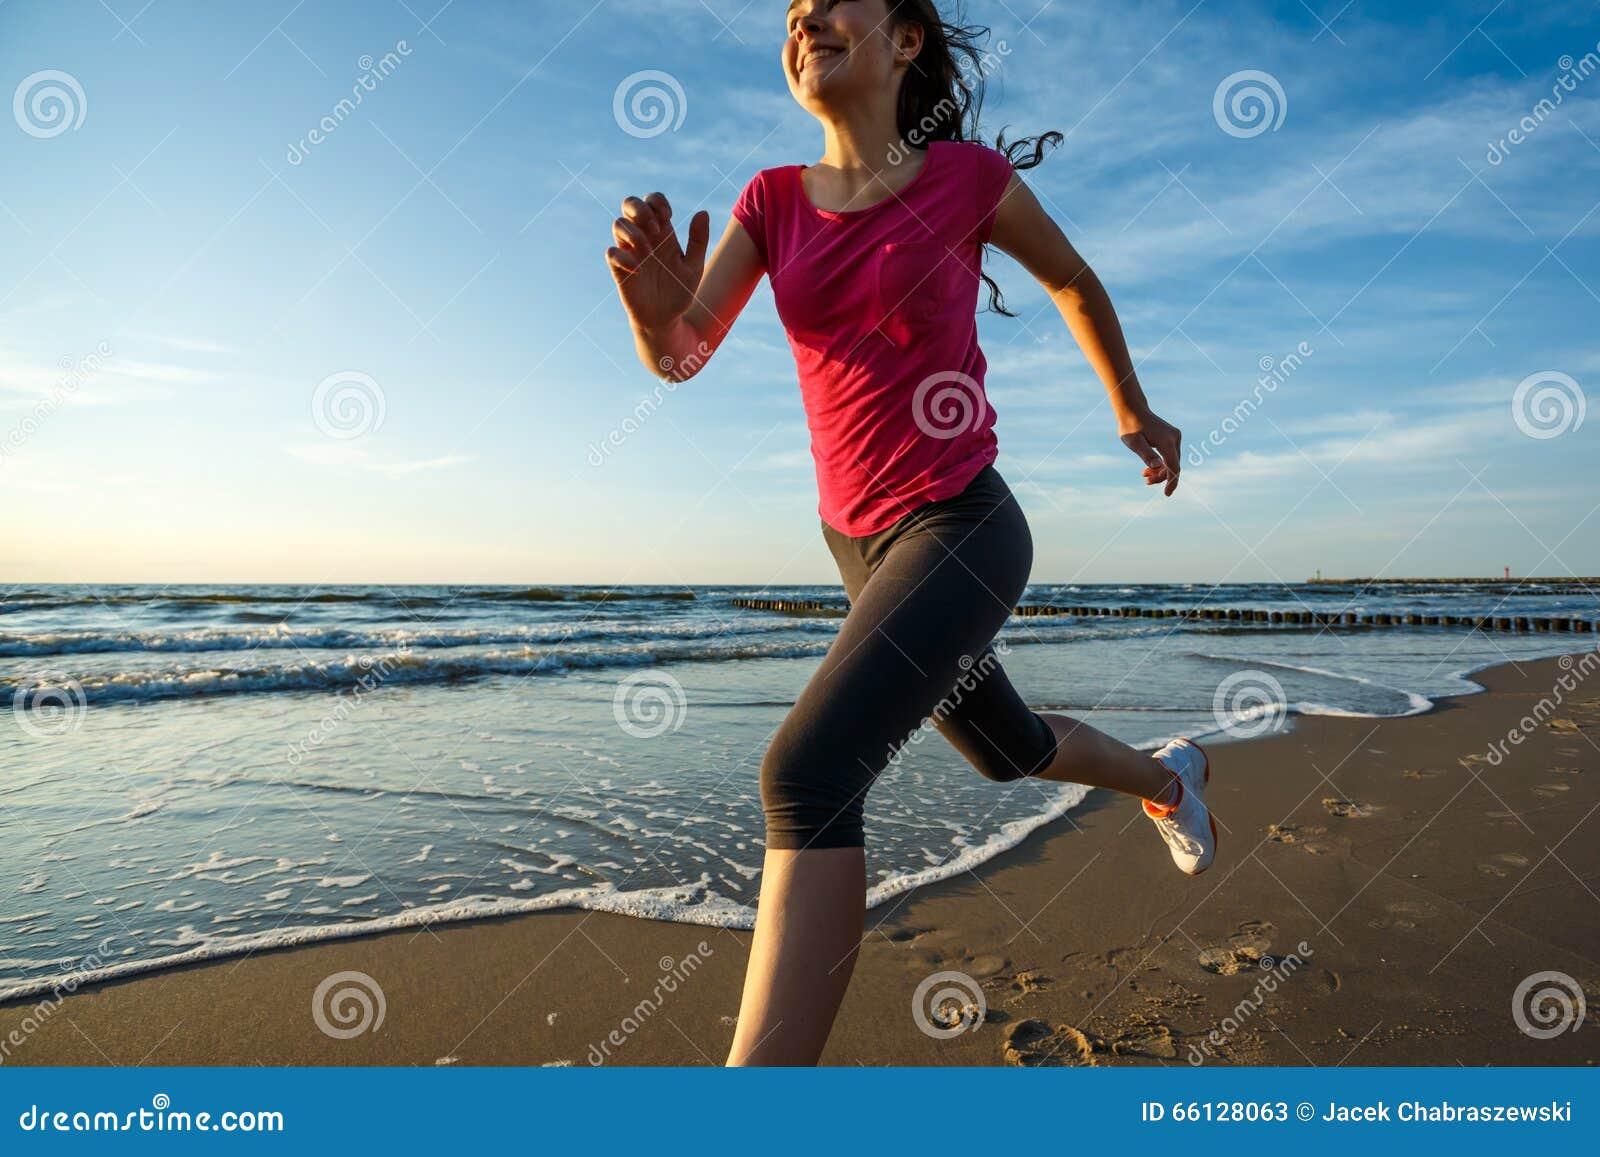 Girl Running On Beach Stock Photo - Image: 66128063 Girl Running On Beach